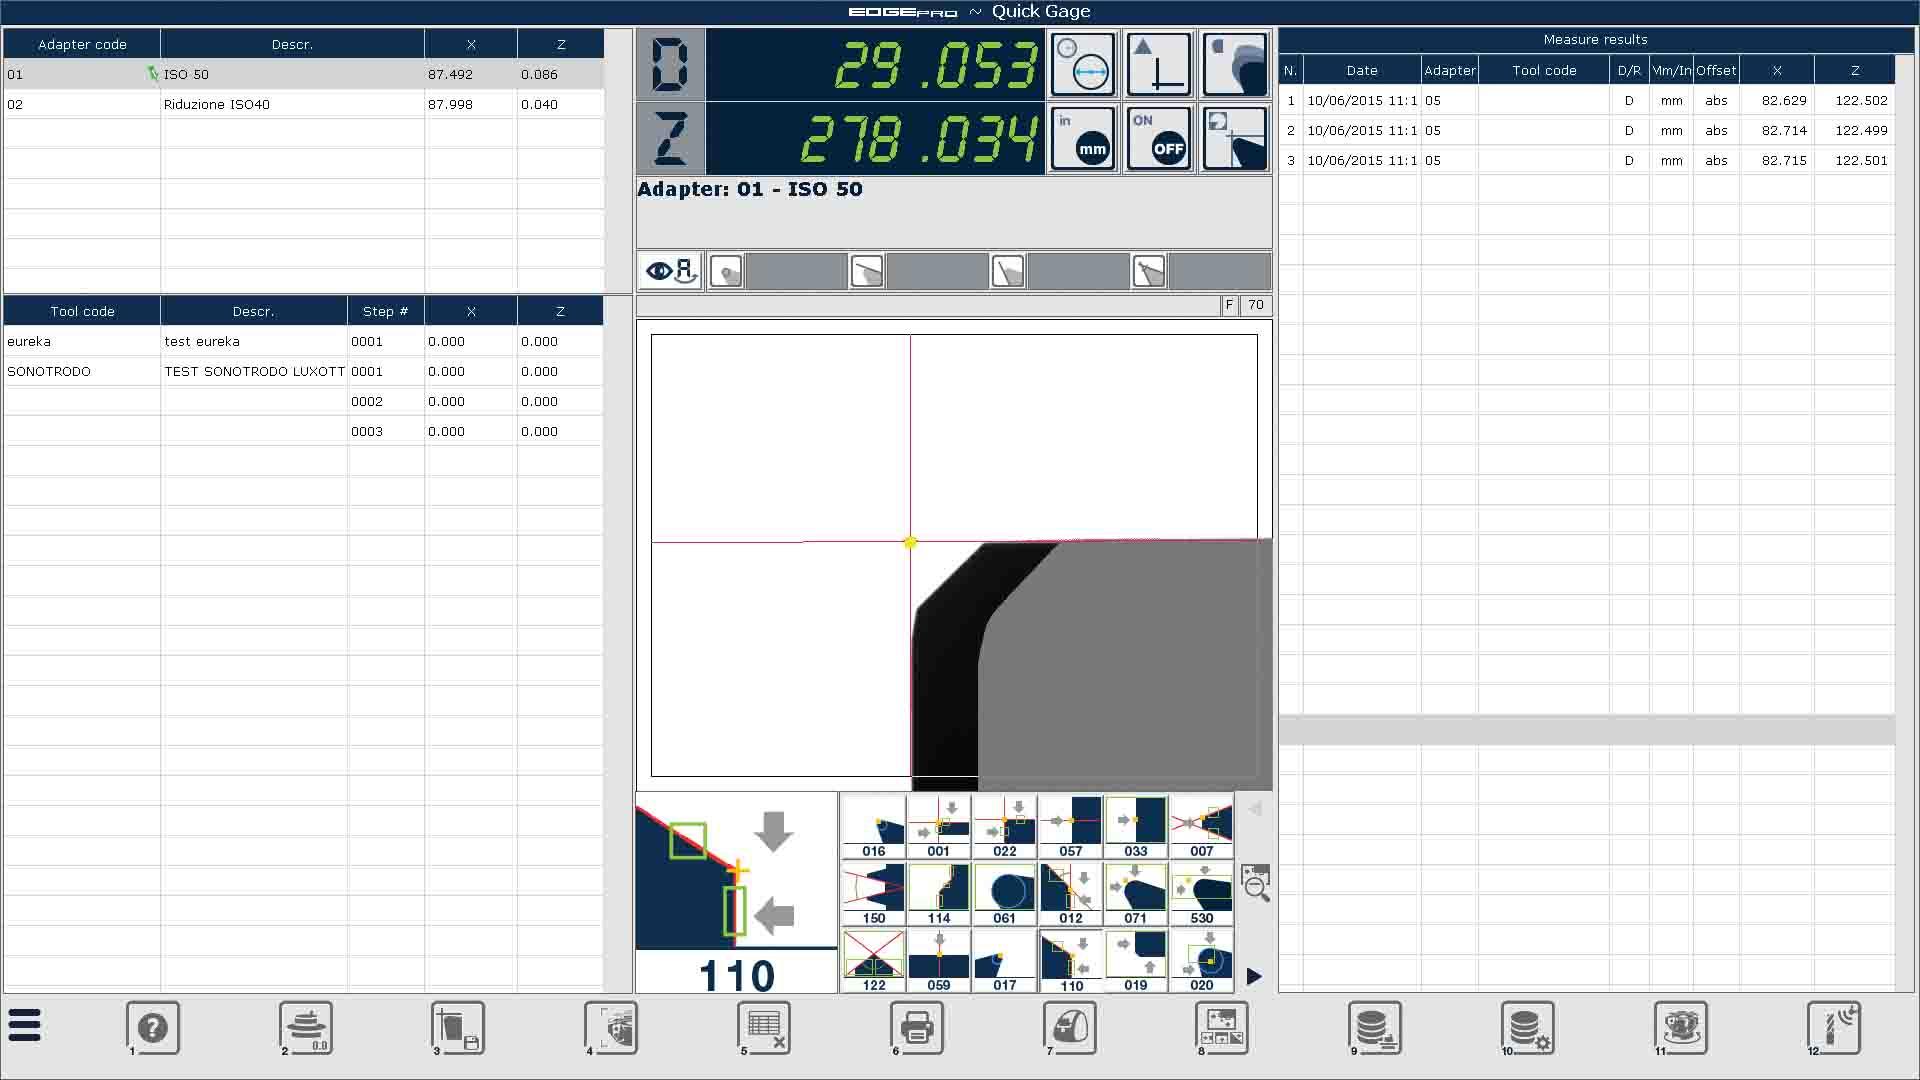 Edge Pro Step Tools screen capture.